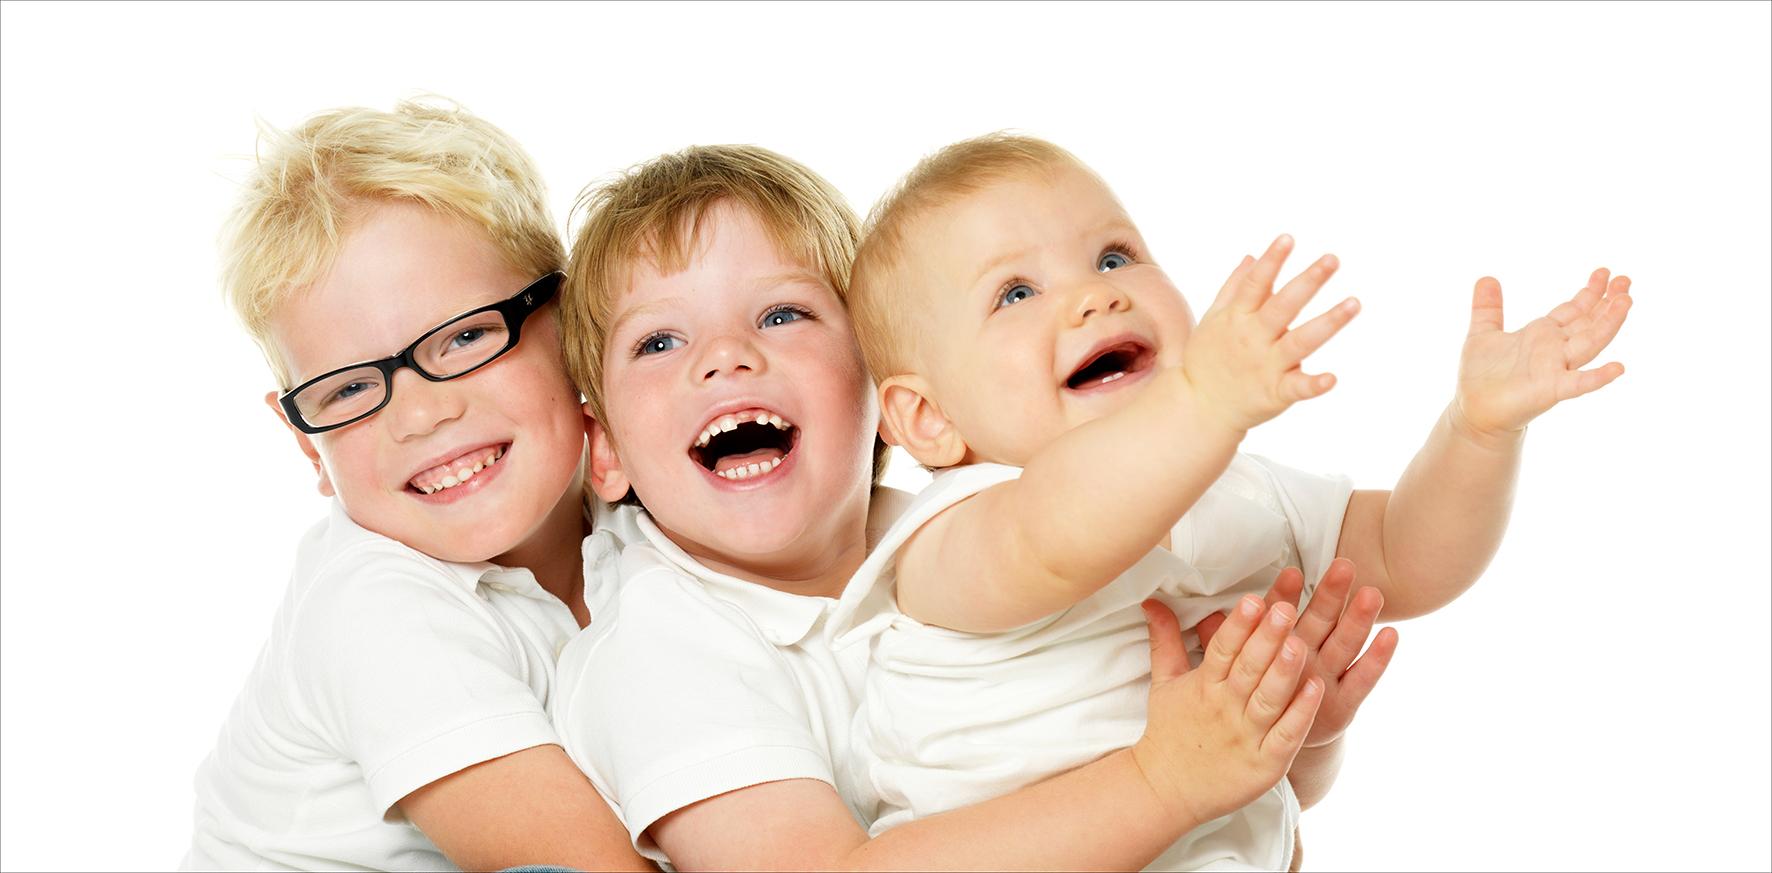 Fotostudio Wyck 3 Kids.jpg